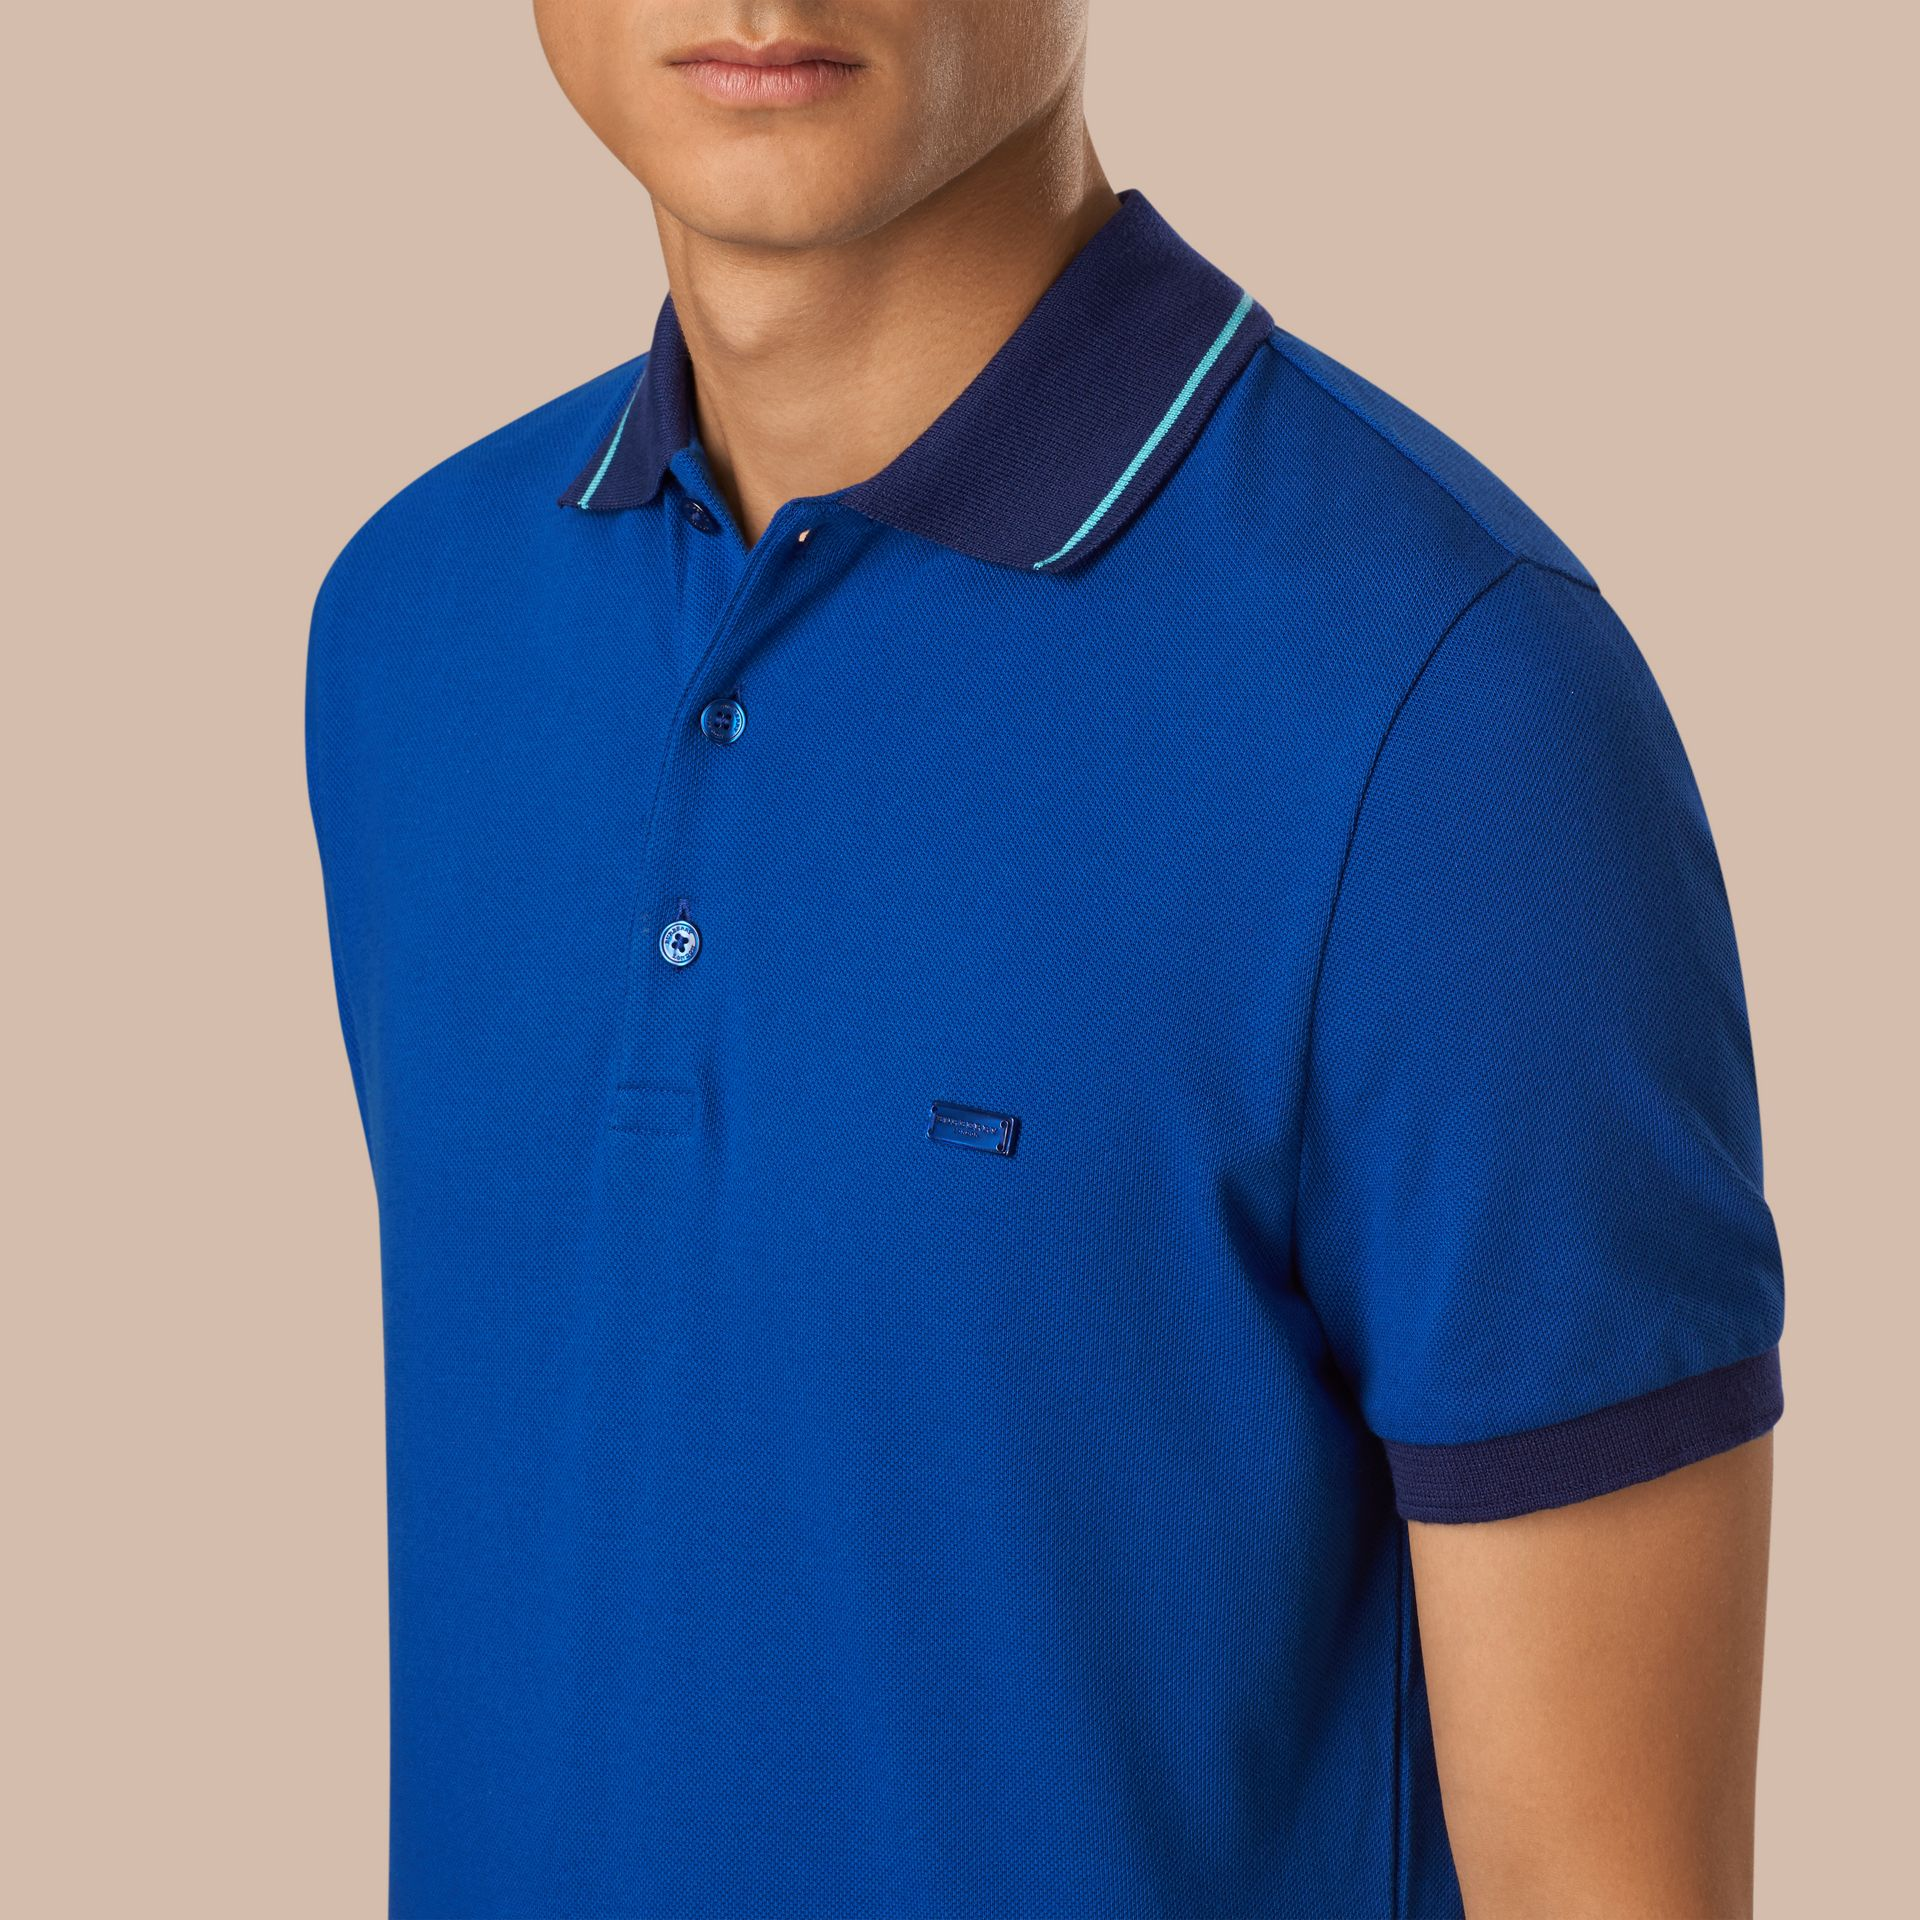 Kobaltblau/helles peridotblau Poloshirt aus Baumwollpiqué mit Kontrastbesatz Kobaltblau/helles Peridotblau - Galerie-Bild 3